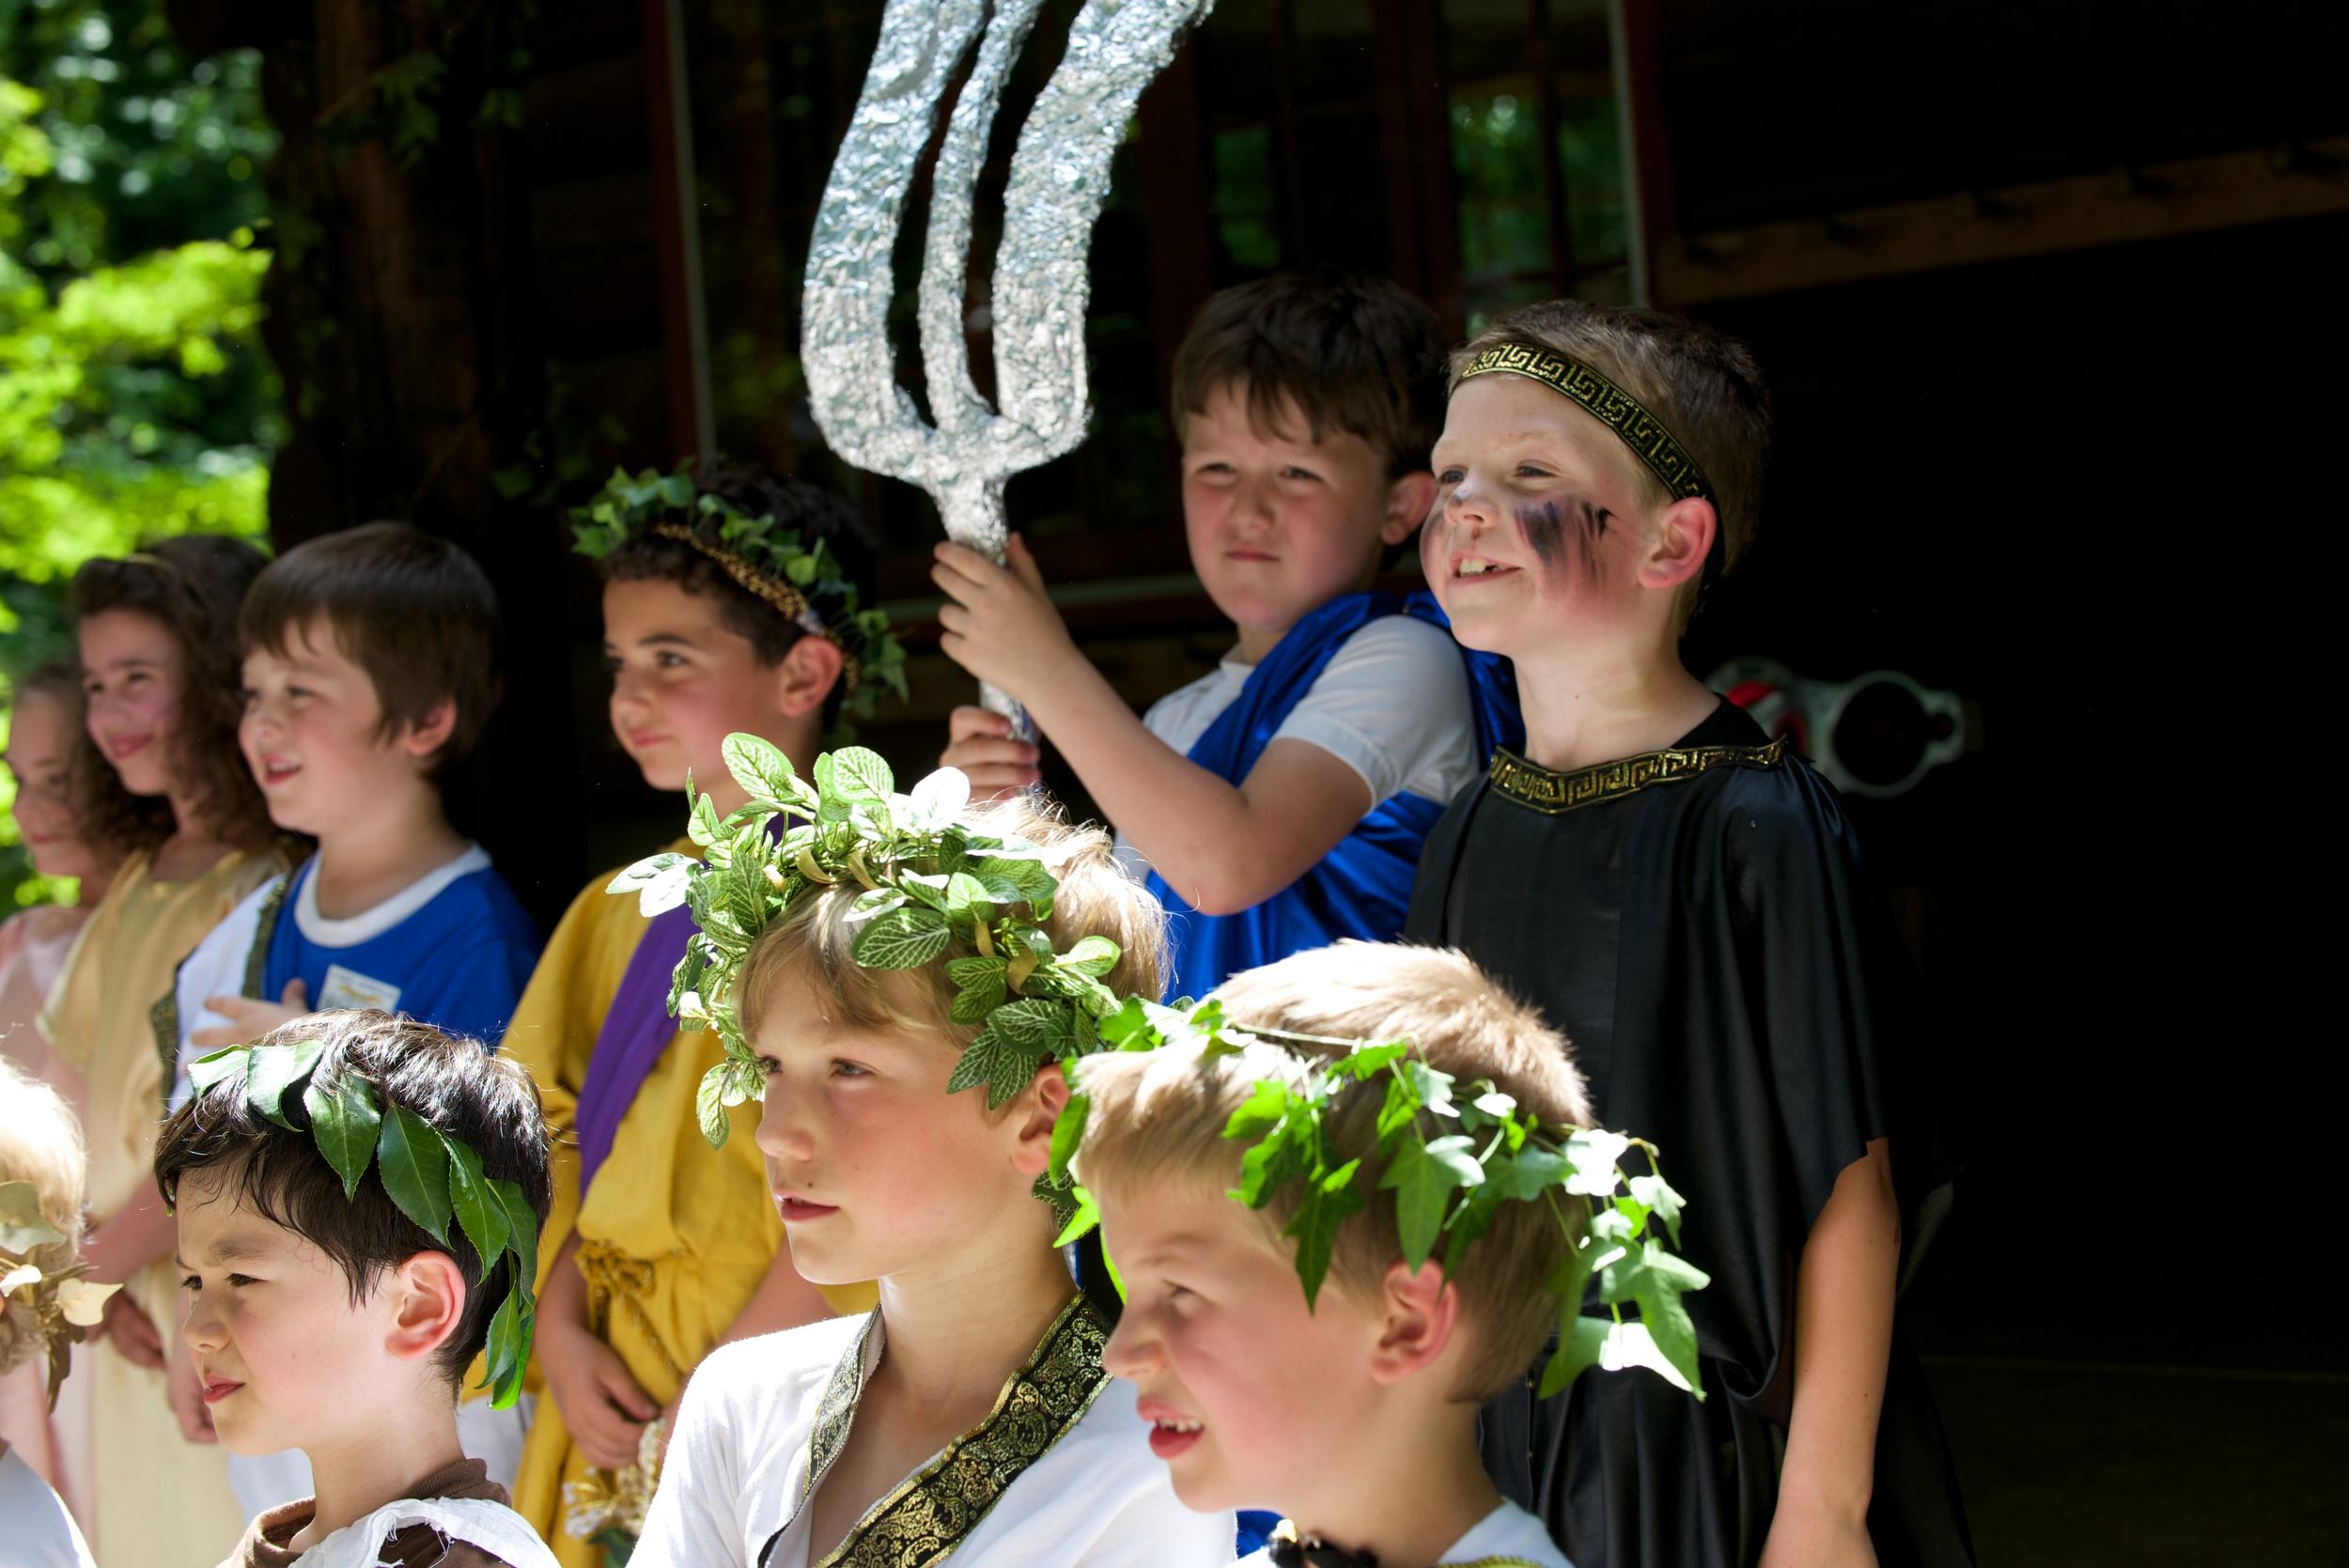 Greeks Wreathed Heads.jpg